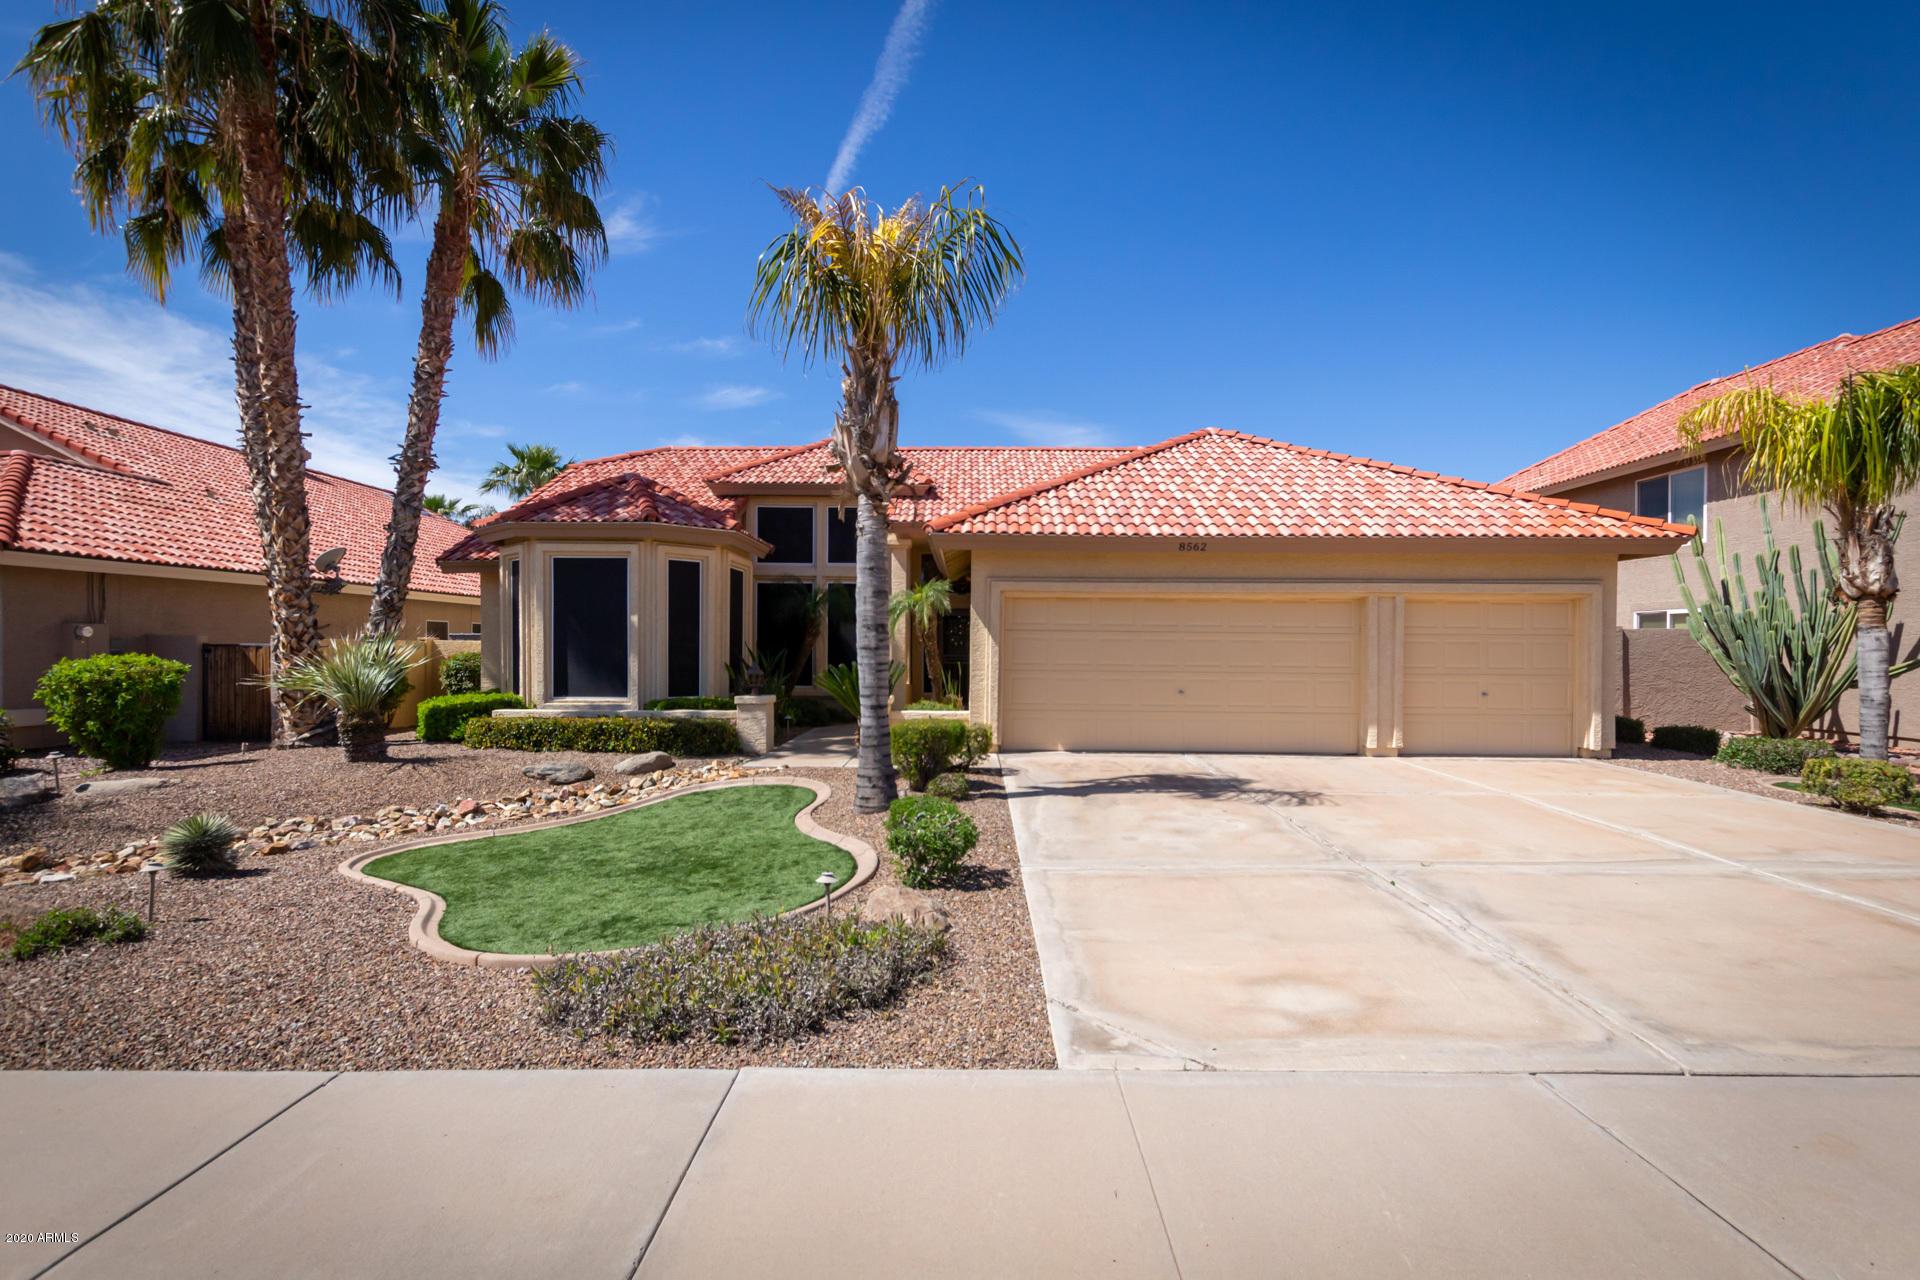 Photo of 8562 S MILL Avenue, Tempe, AZ 85284